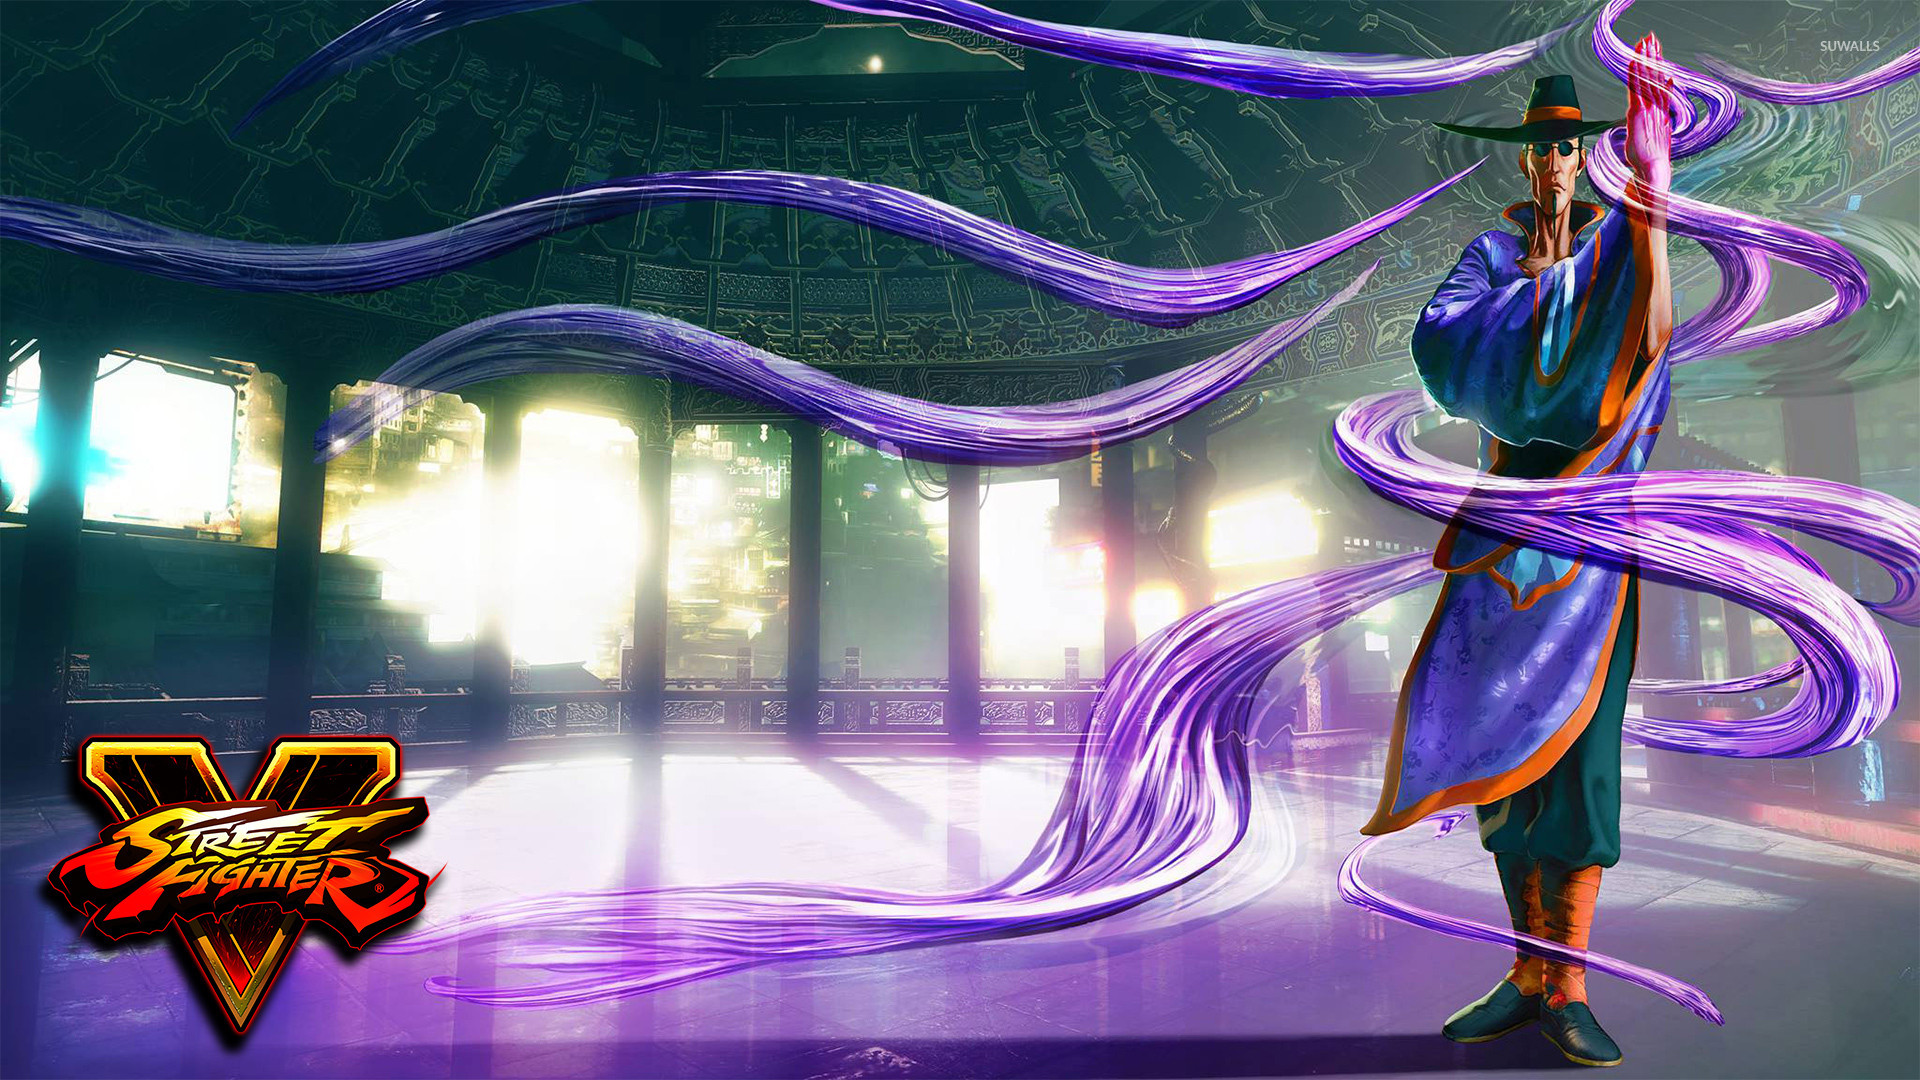 F.A.N.G. in Street Fighter V wallpaper